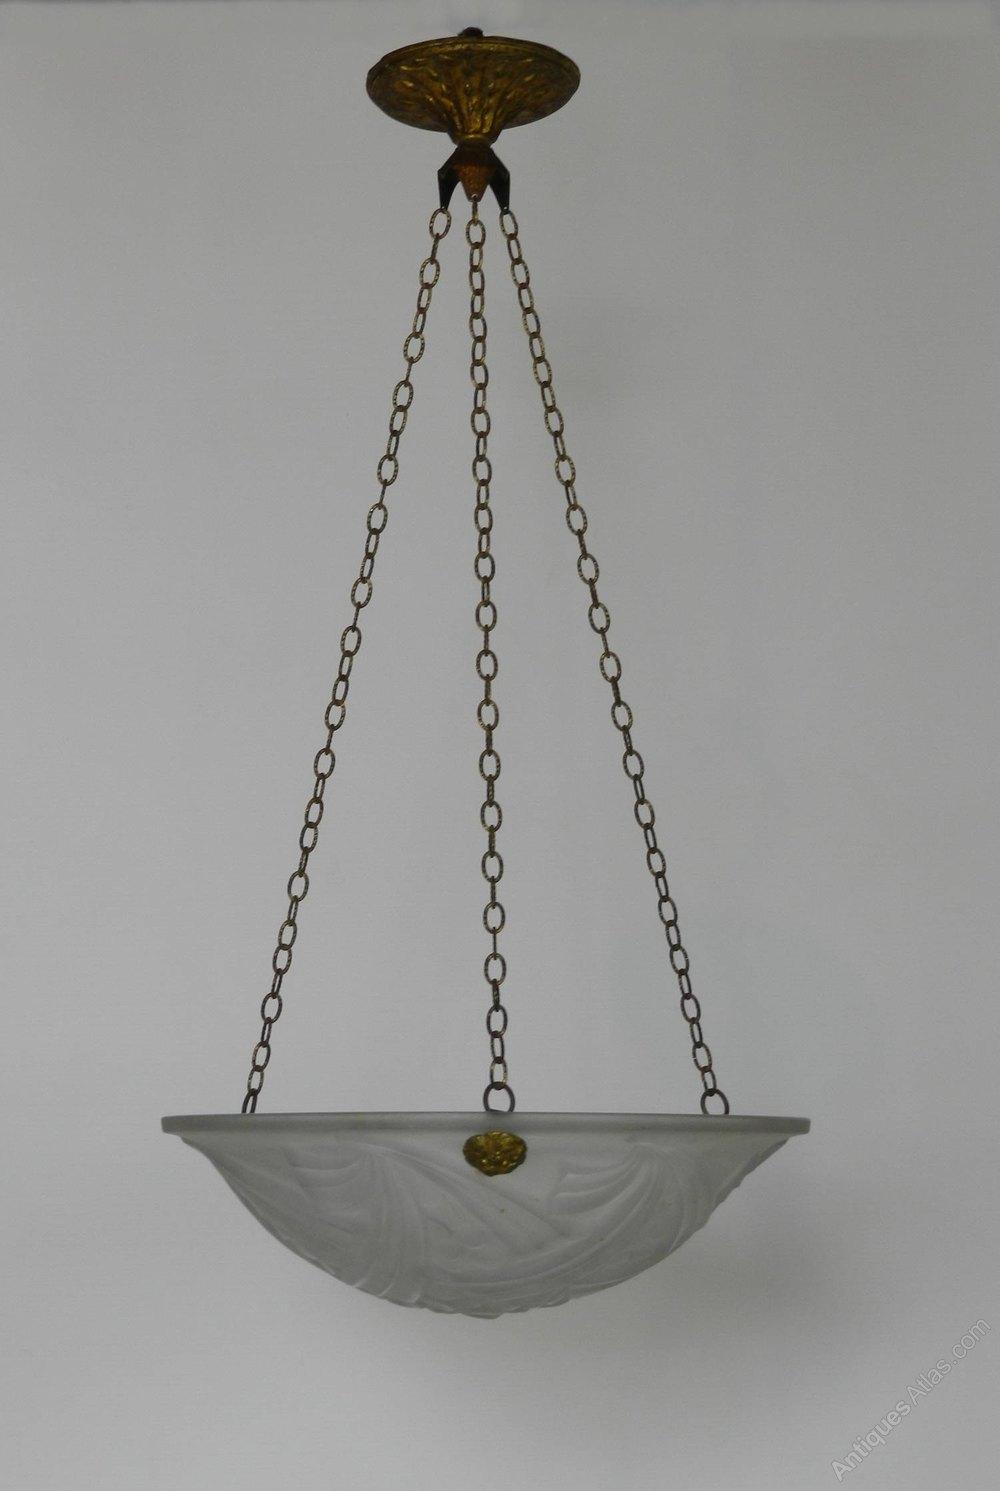 French Art Deco Ceiling Light Negra Dégué Antique Hanging Lights